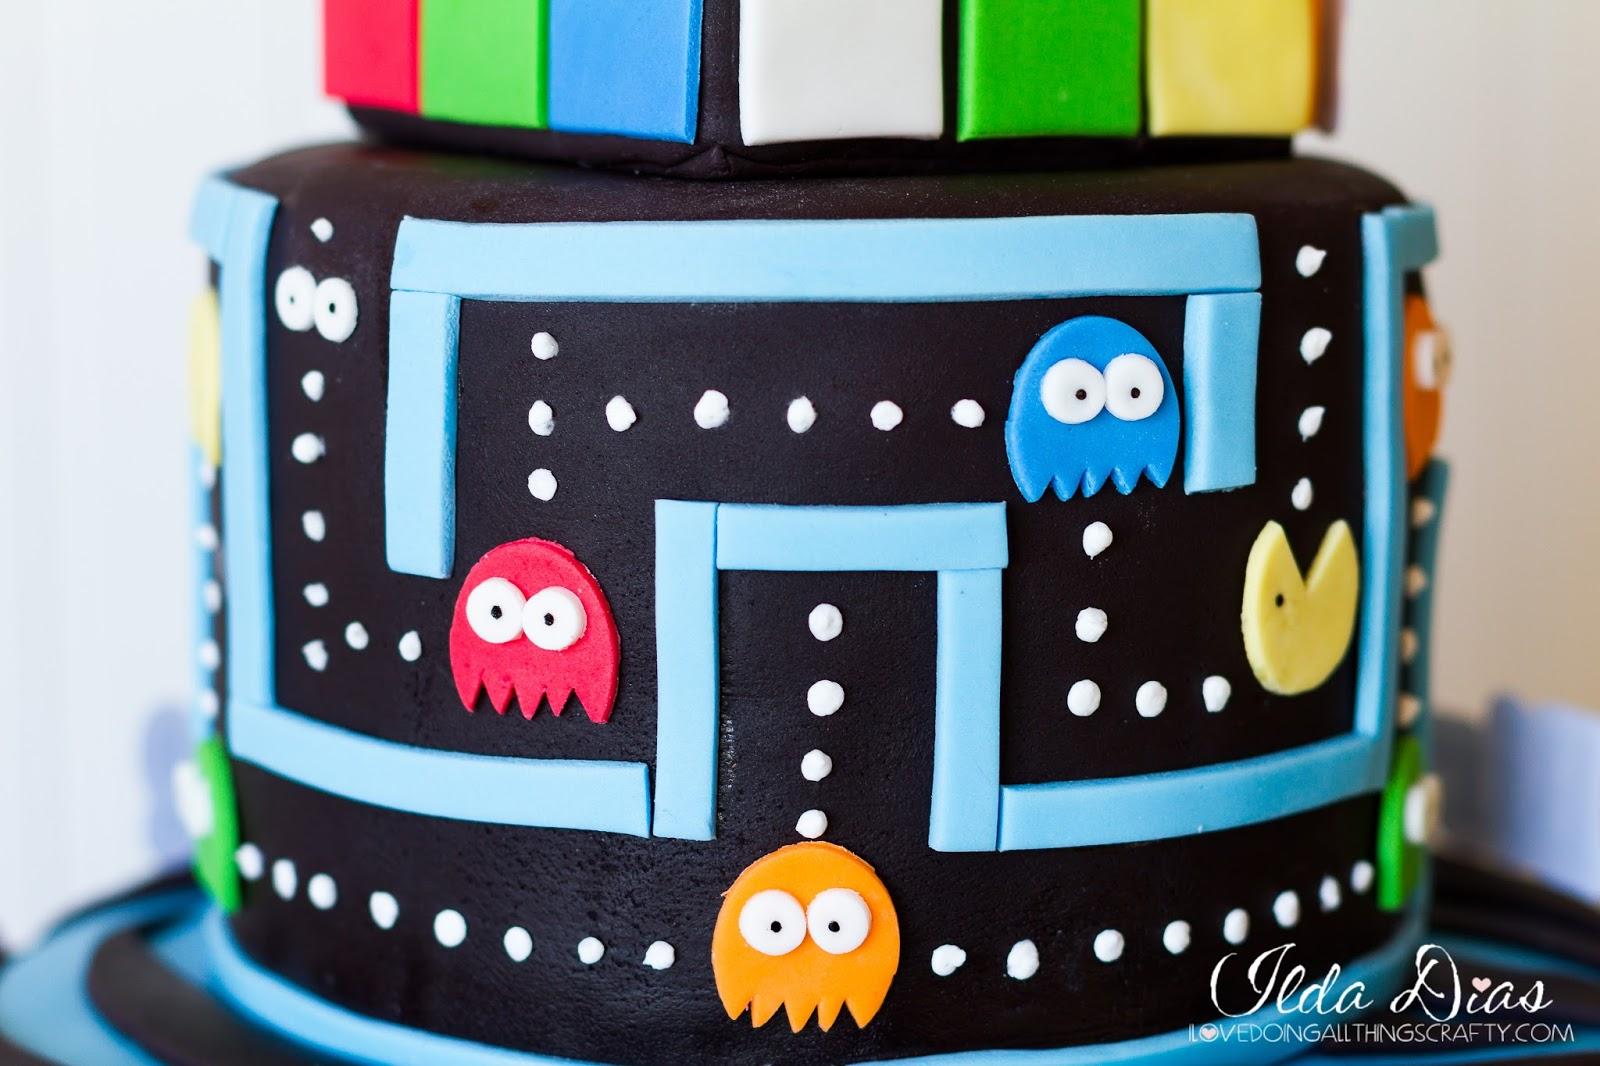 I Love Doing All Things Crafty 80s Themed Cake Bonus Timlapse Videos